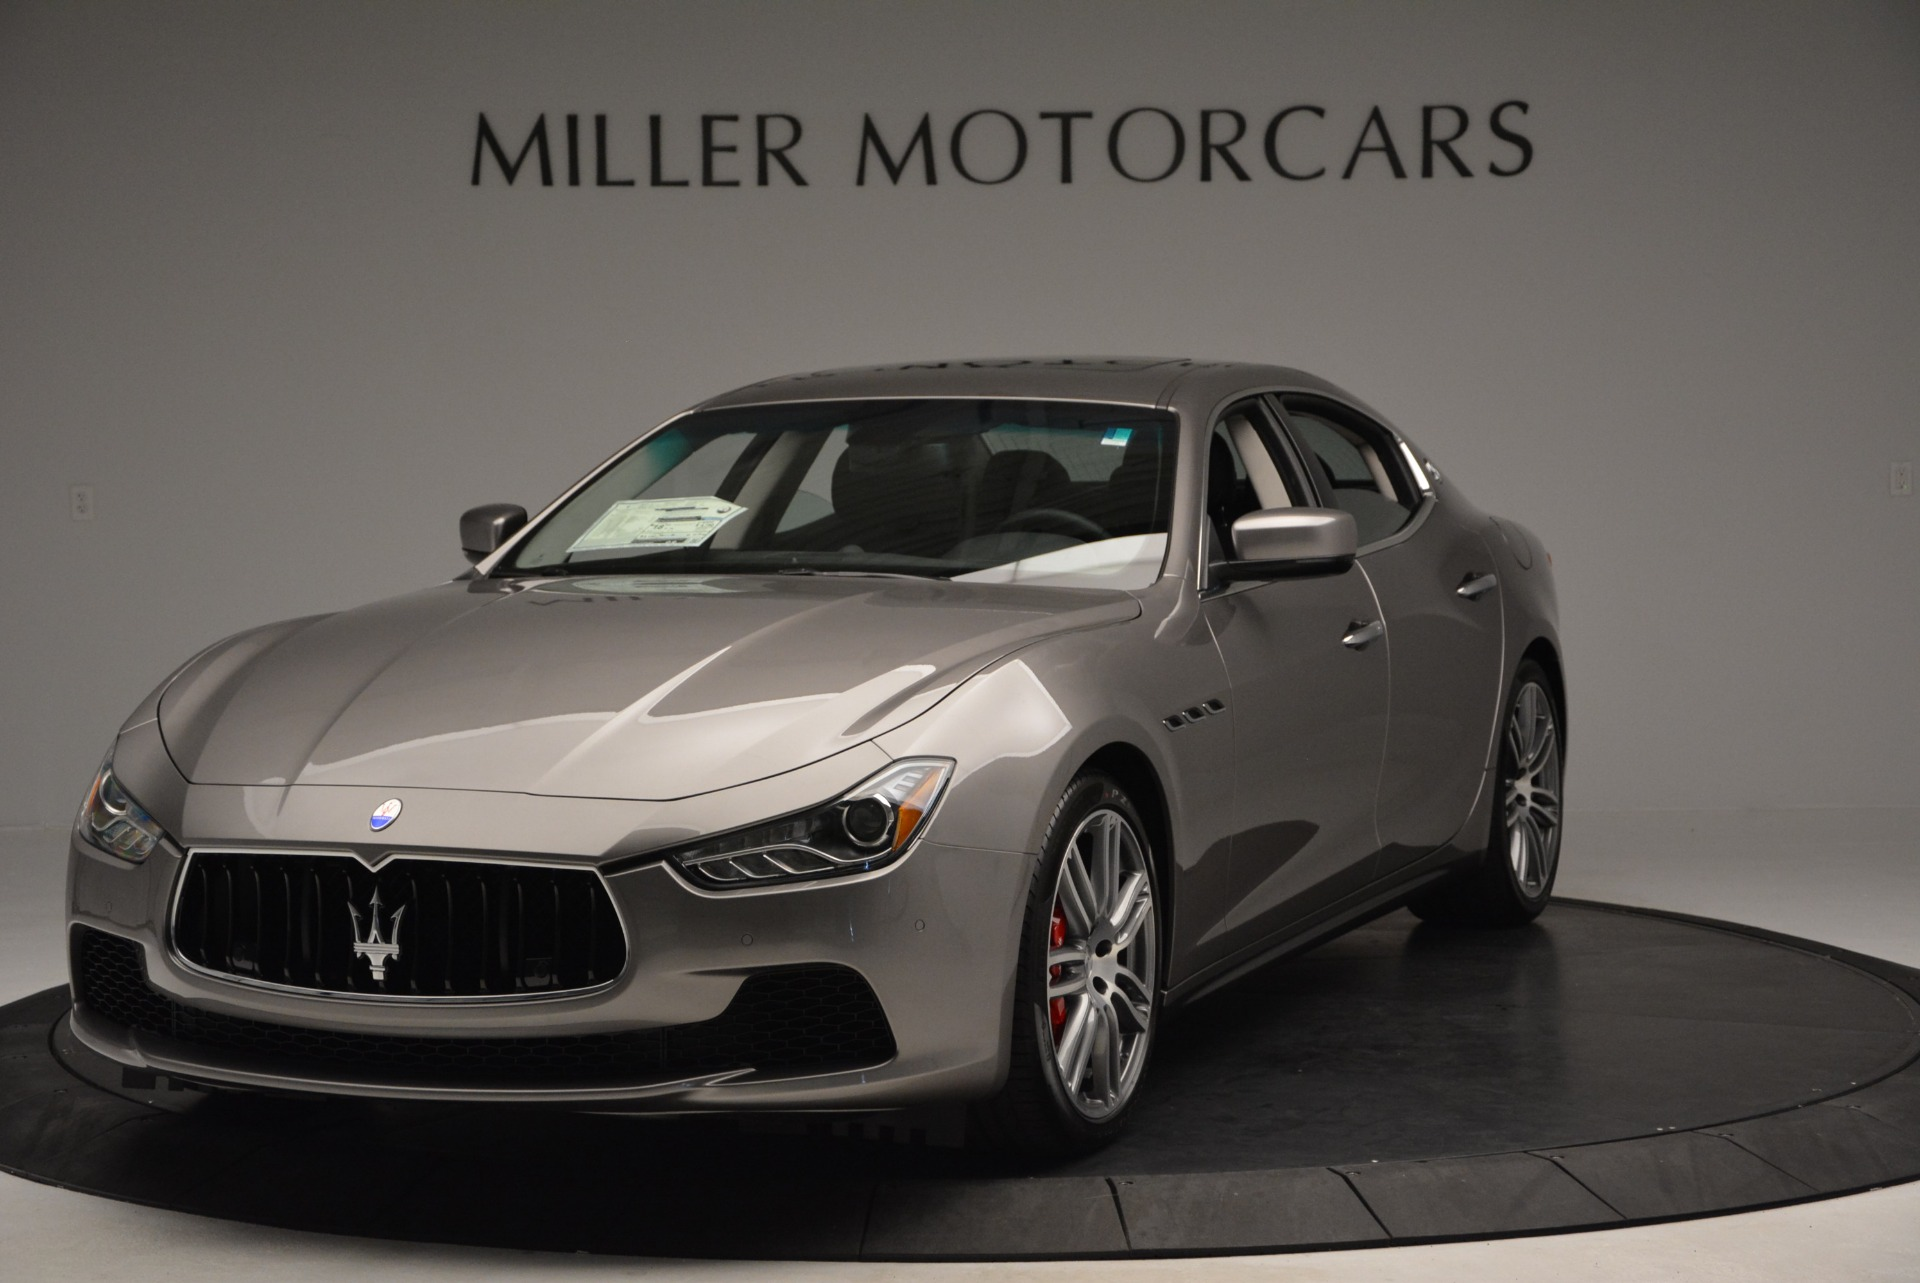 Used 2014 Maserati Ghibli S Q4 For Sale In Greenwich, CT. Alfa Romeo of Greenwich, 7426 2562_main